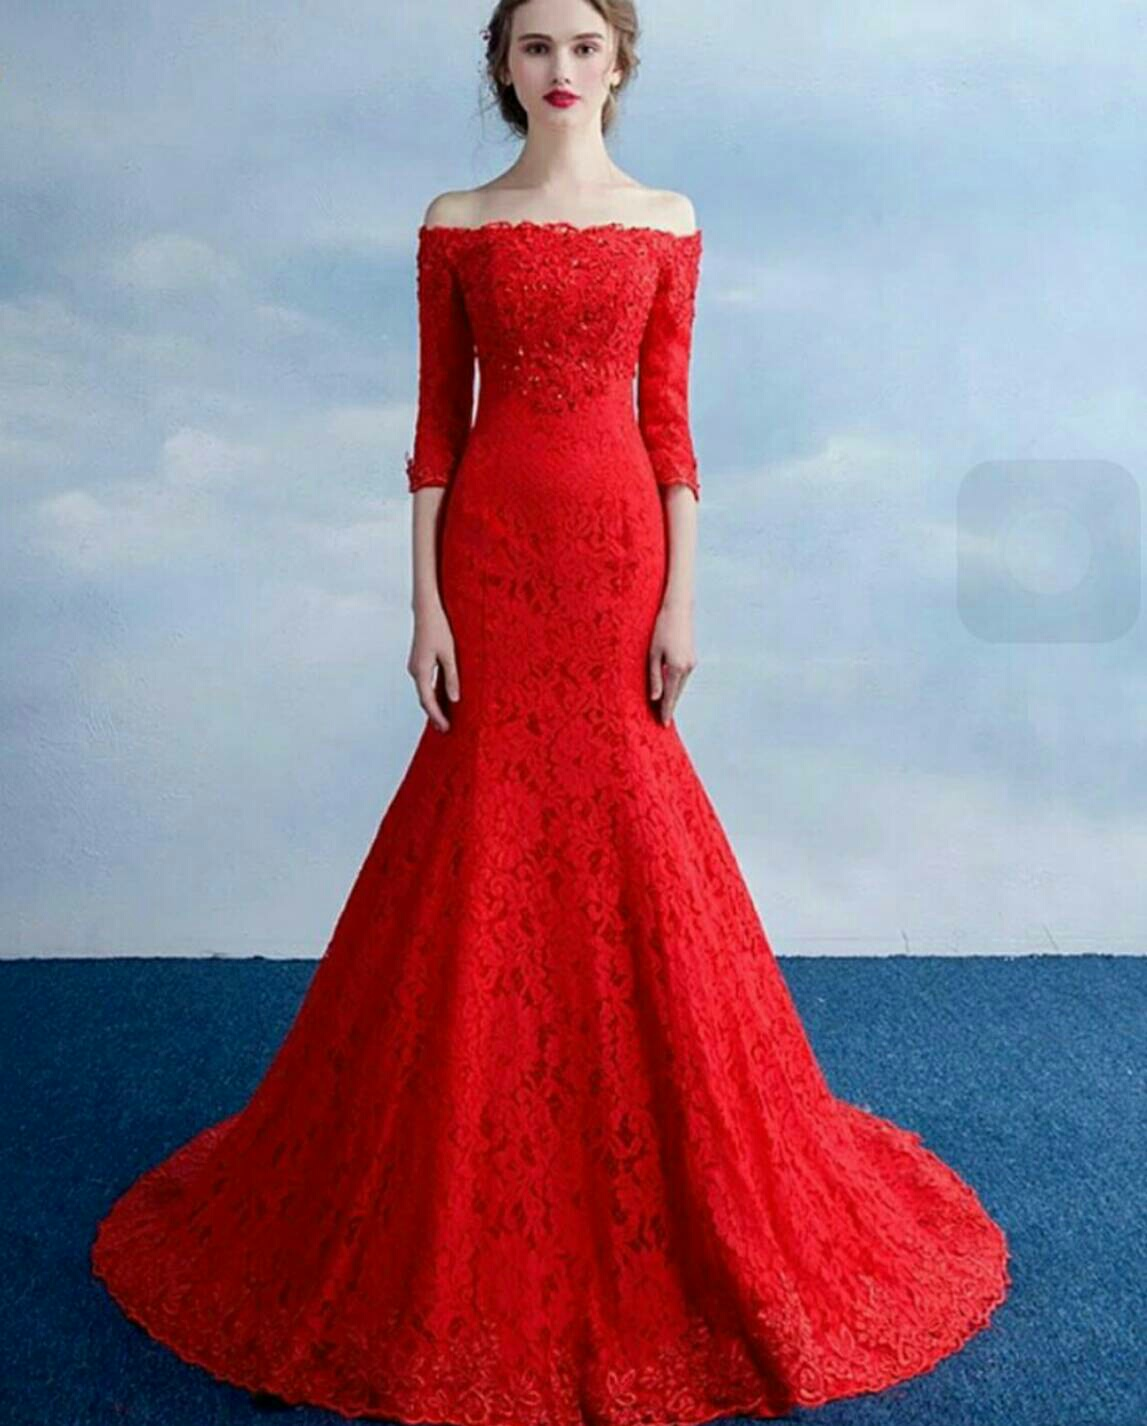 Baju Gaun Long Dress Maxy Mermaid Merah Model Terbaru Ryn Fashion